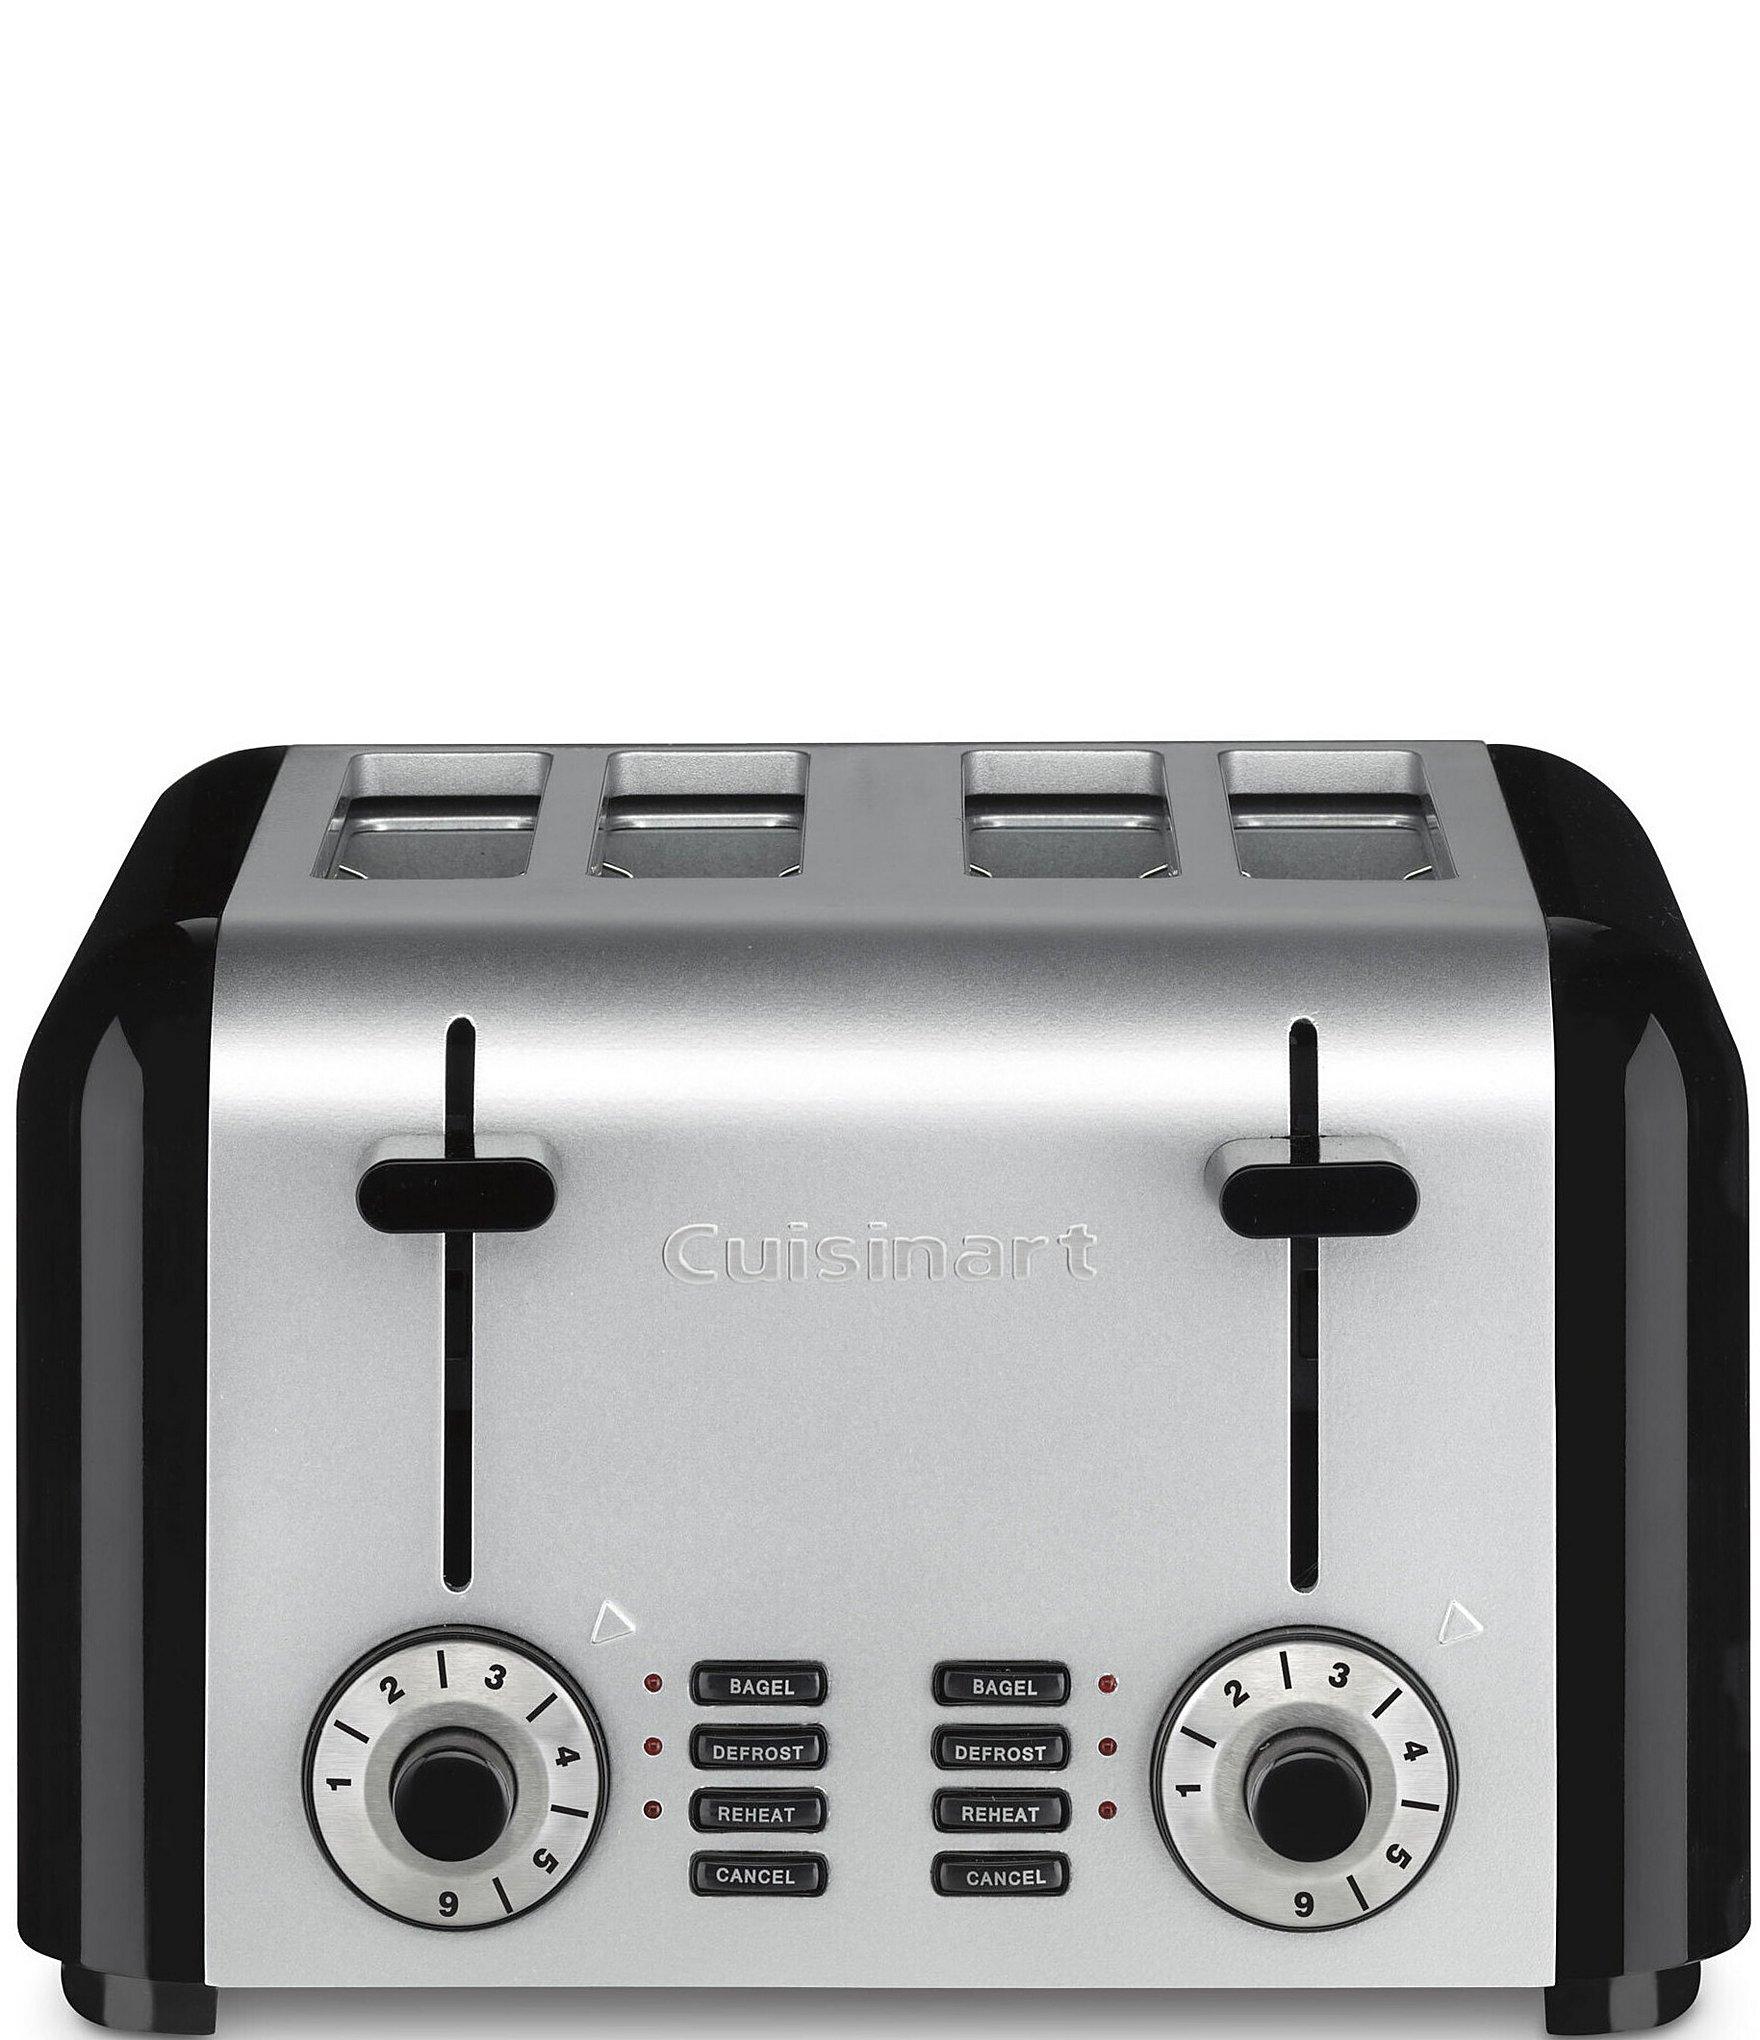 cuisinart stainless steel black 4 slice toaster dillards. Black Bedroom Furniture Sets. Home Design Ideas